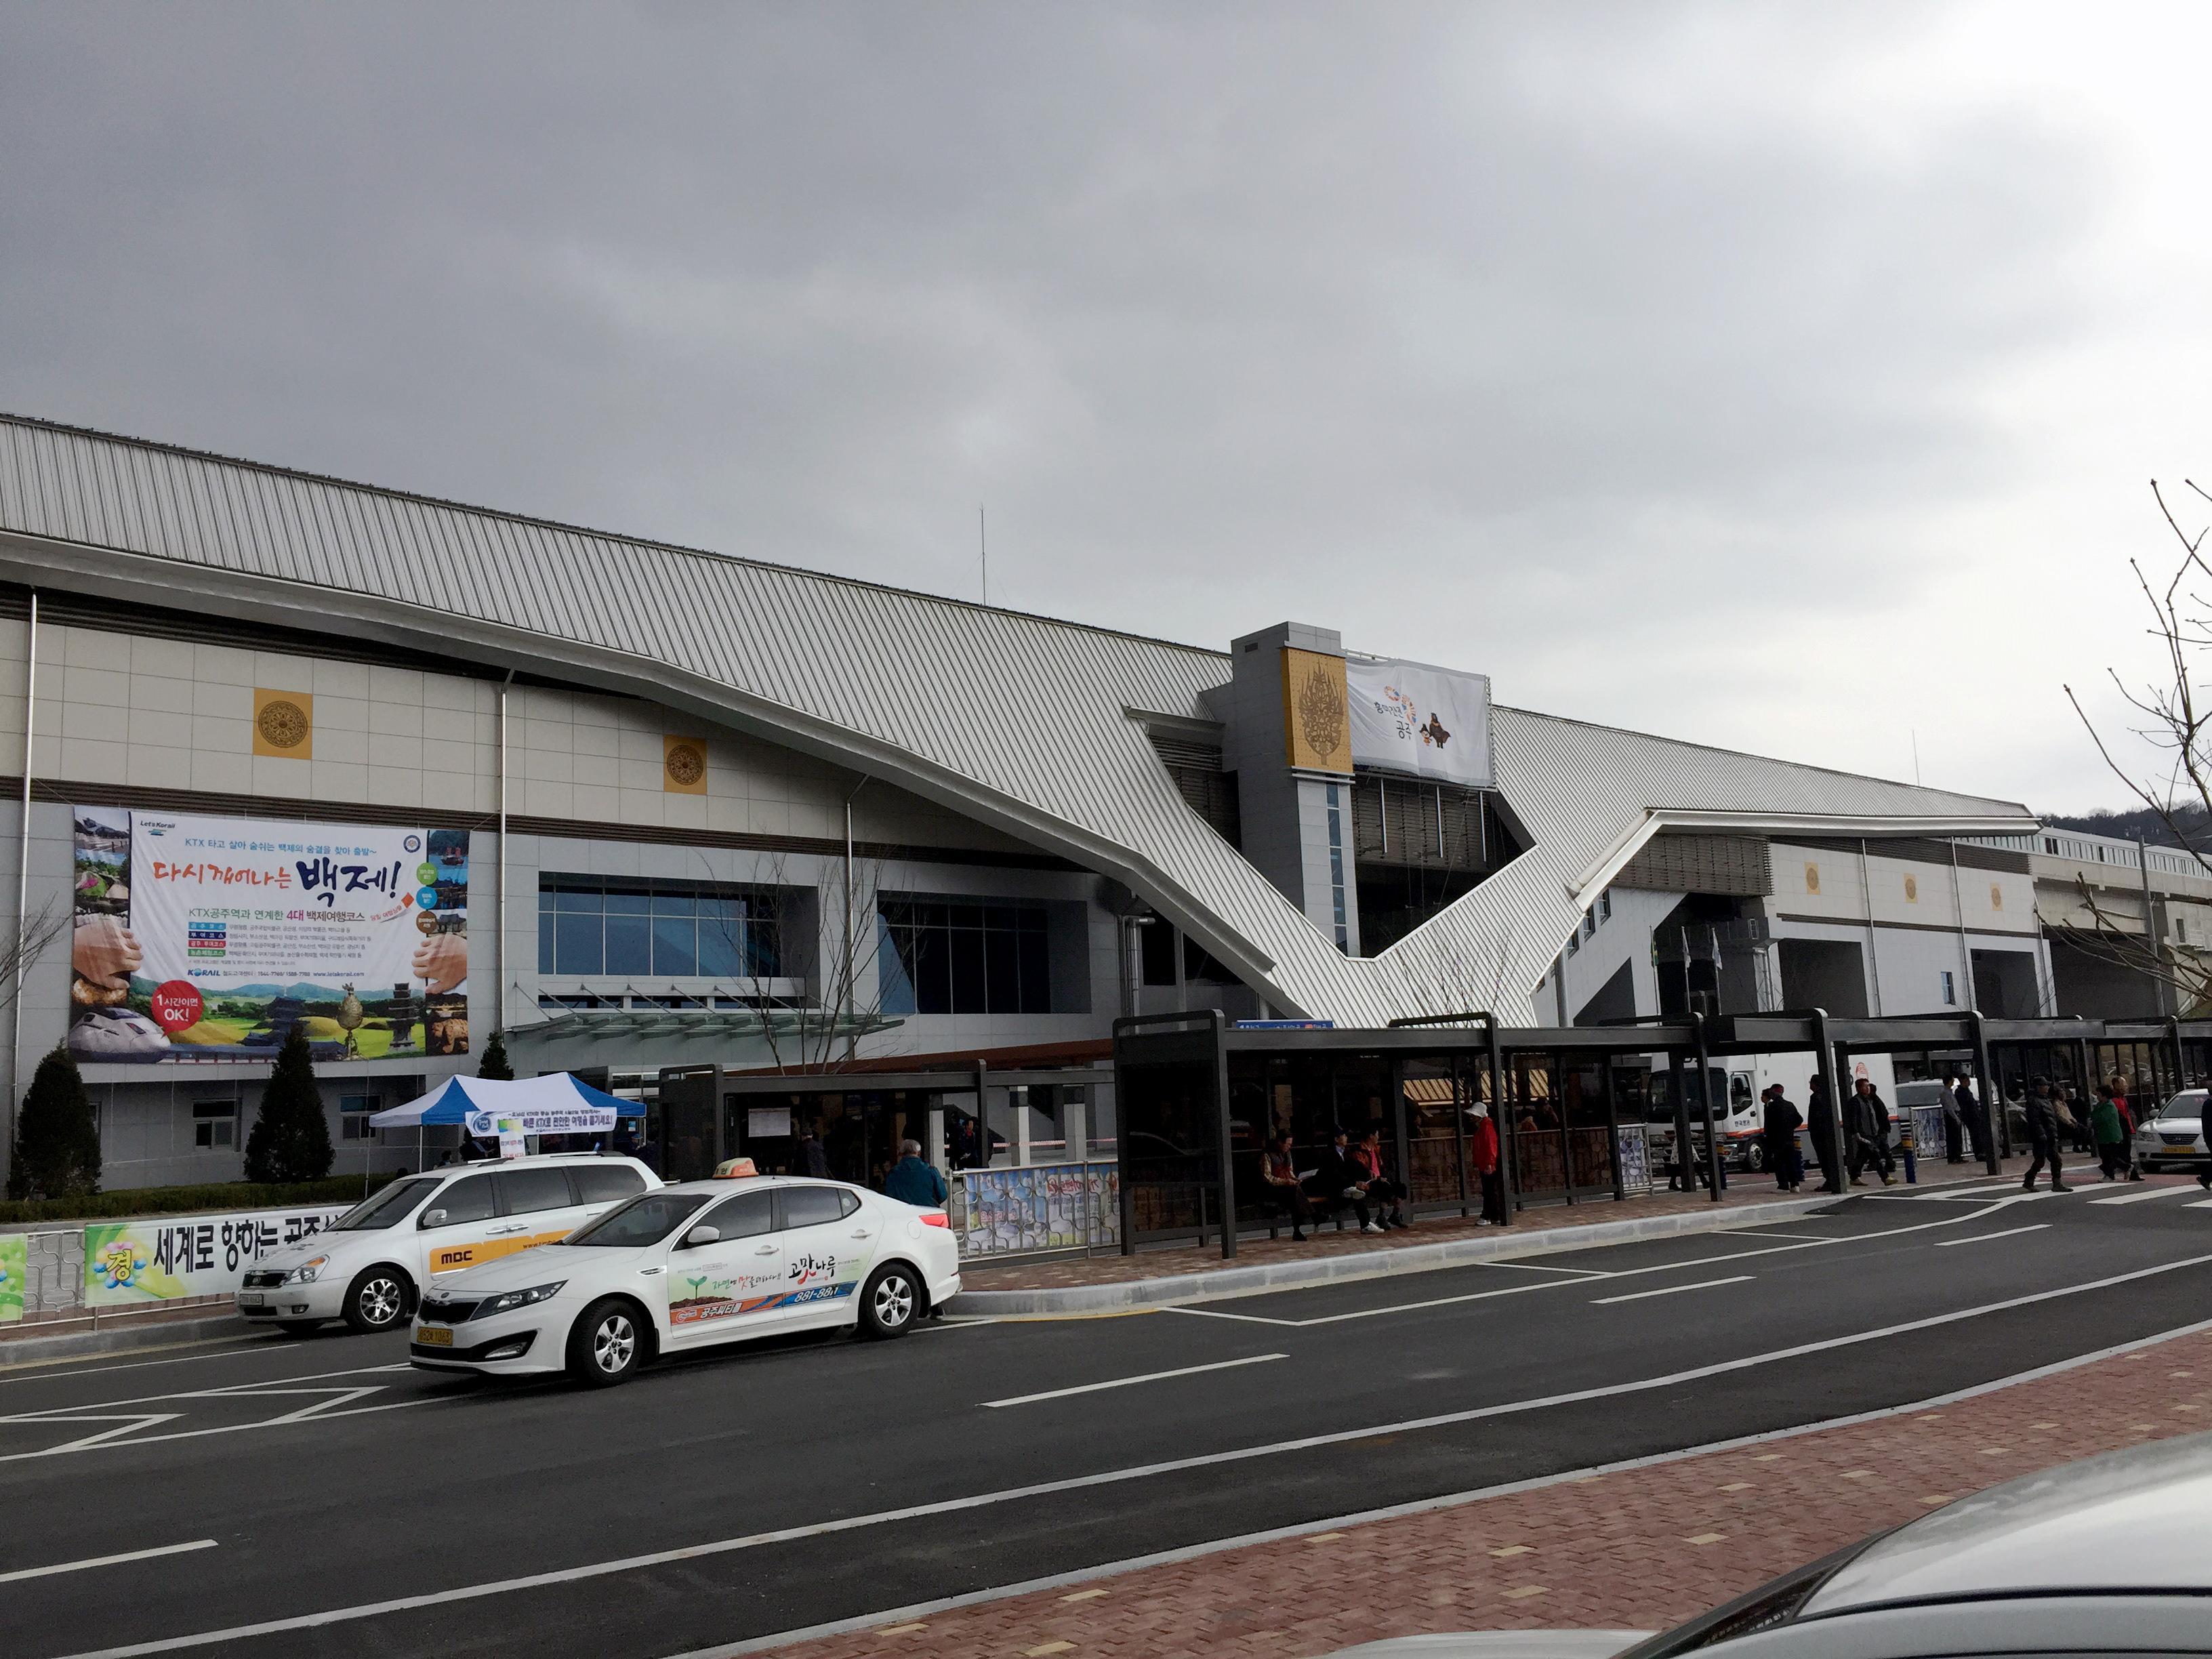 Gongju Station 20150402 143328.JPG